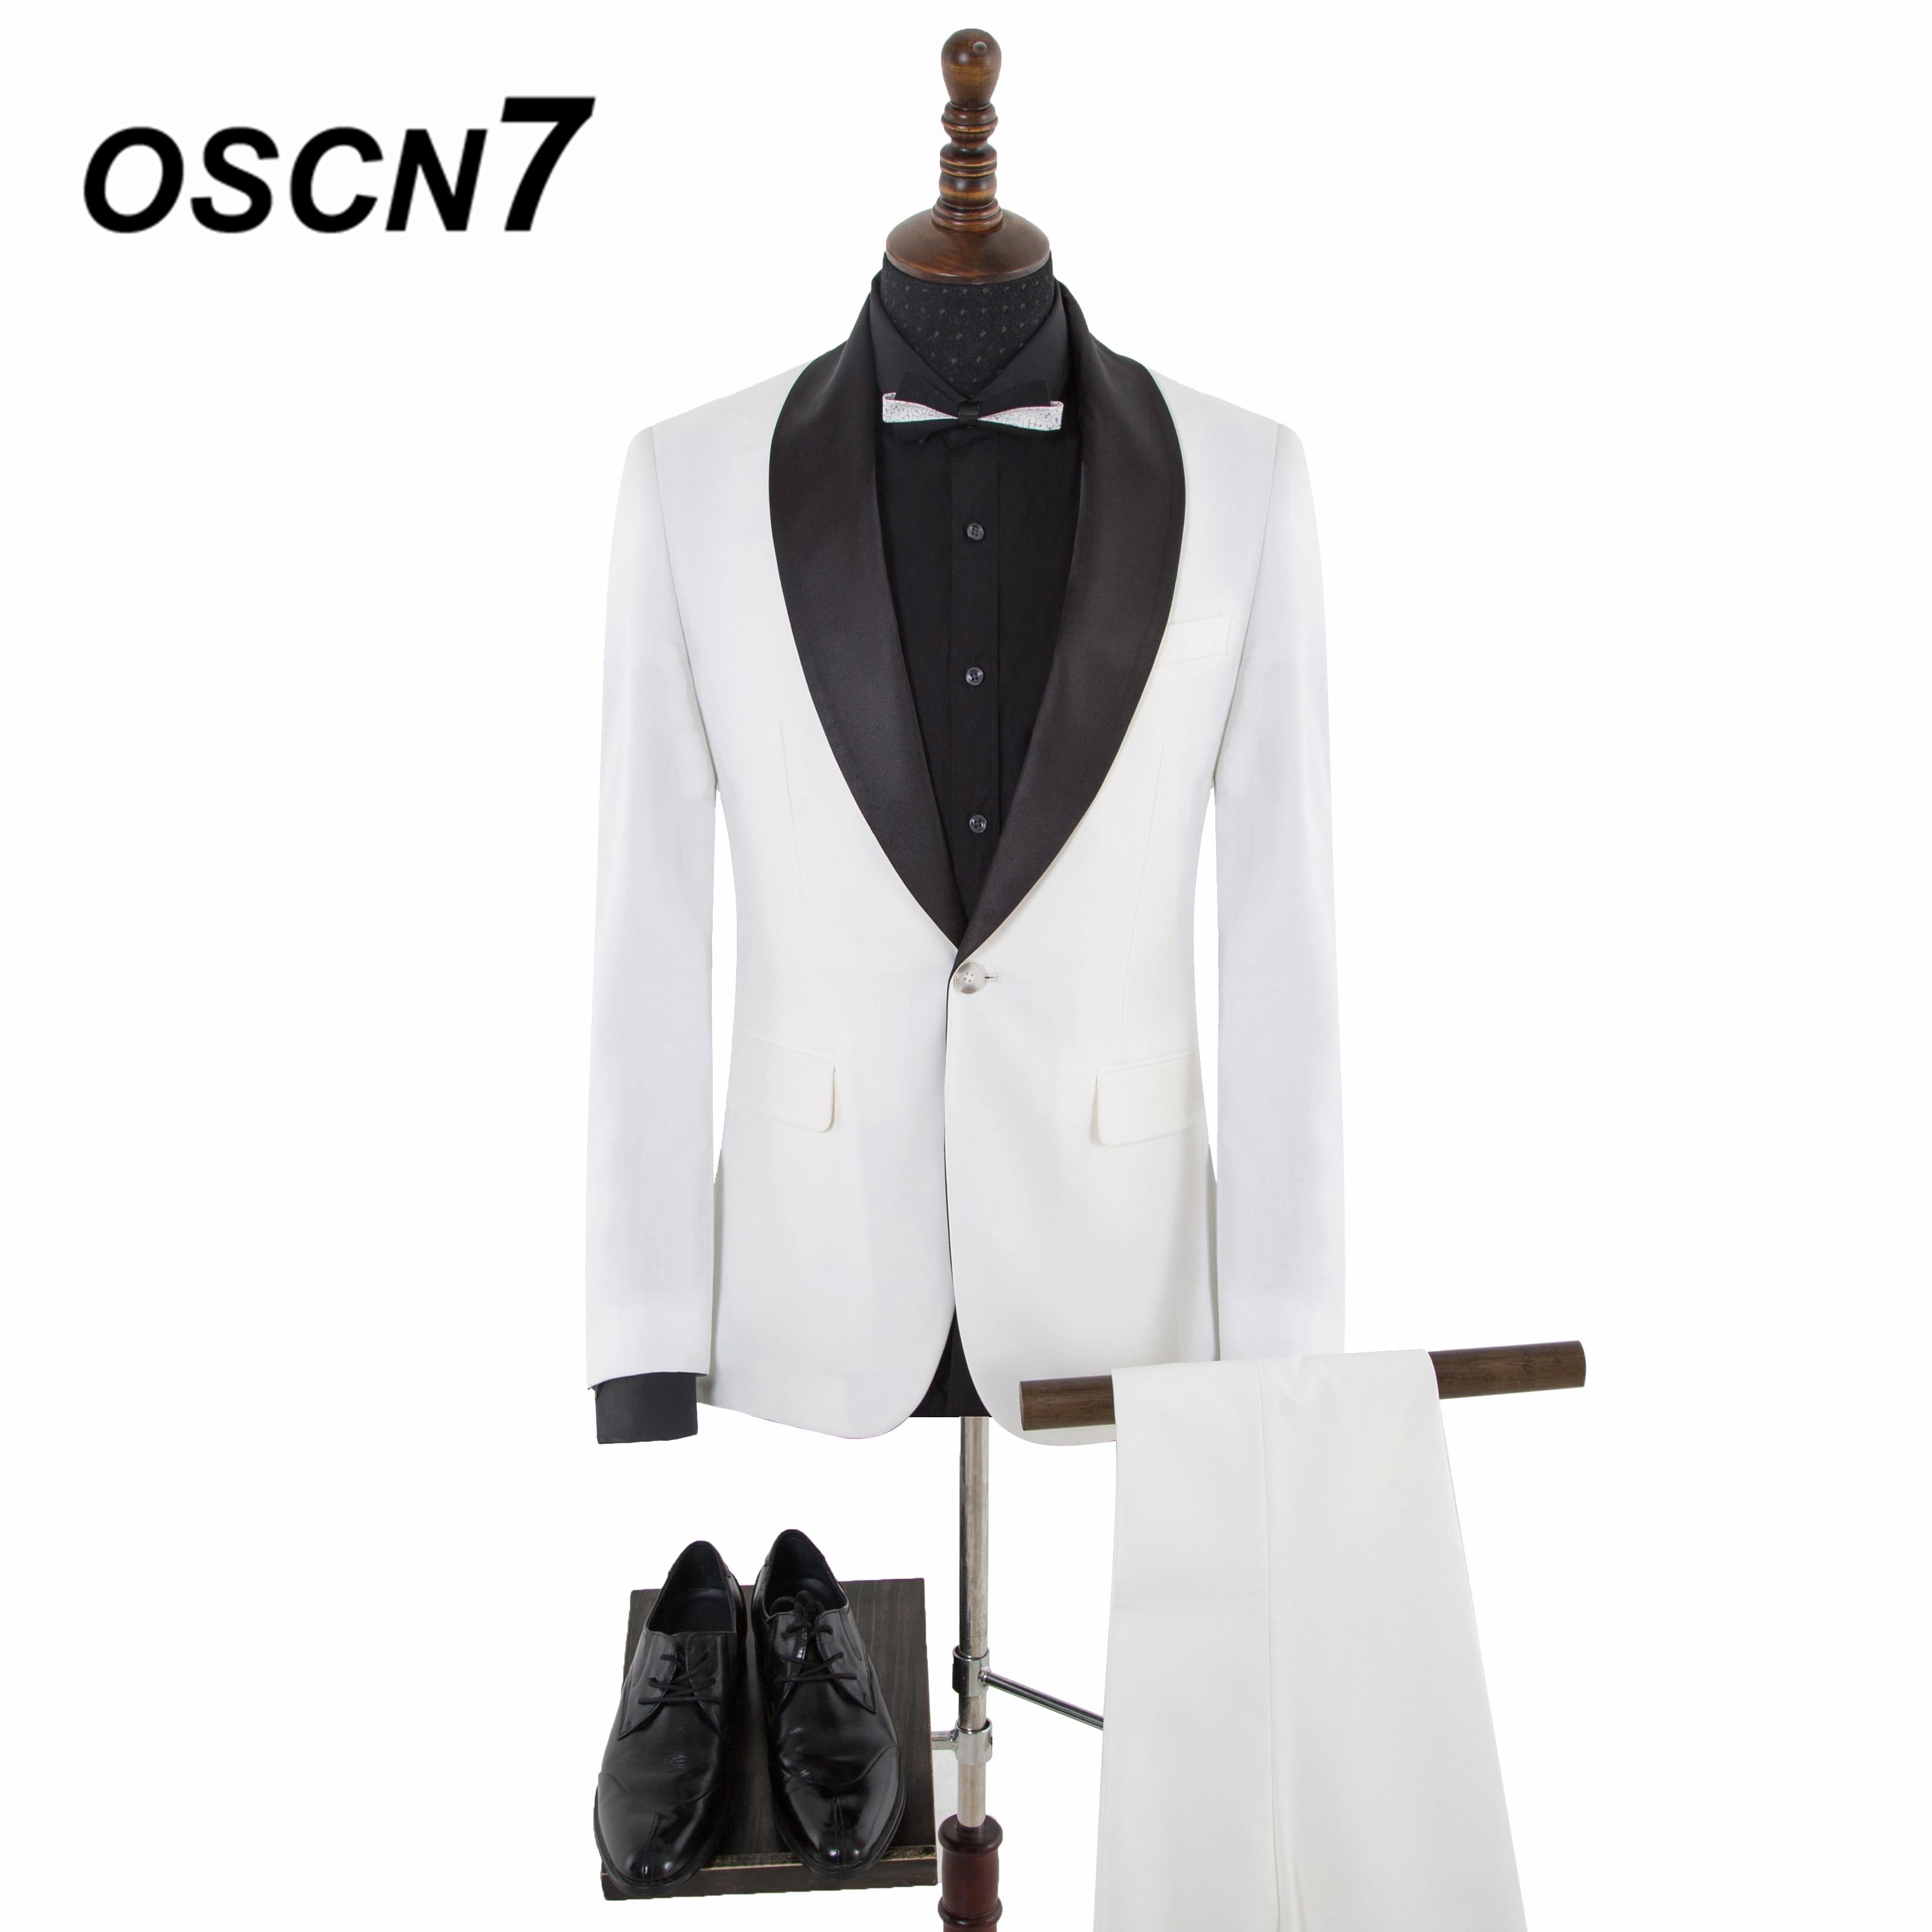 OSCN7 Contrast color Design Wide Shawl Lapels Business Casua